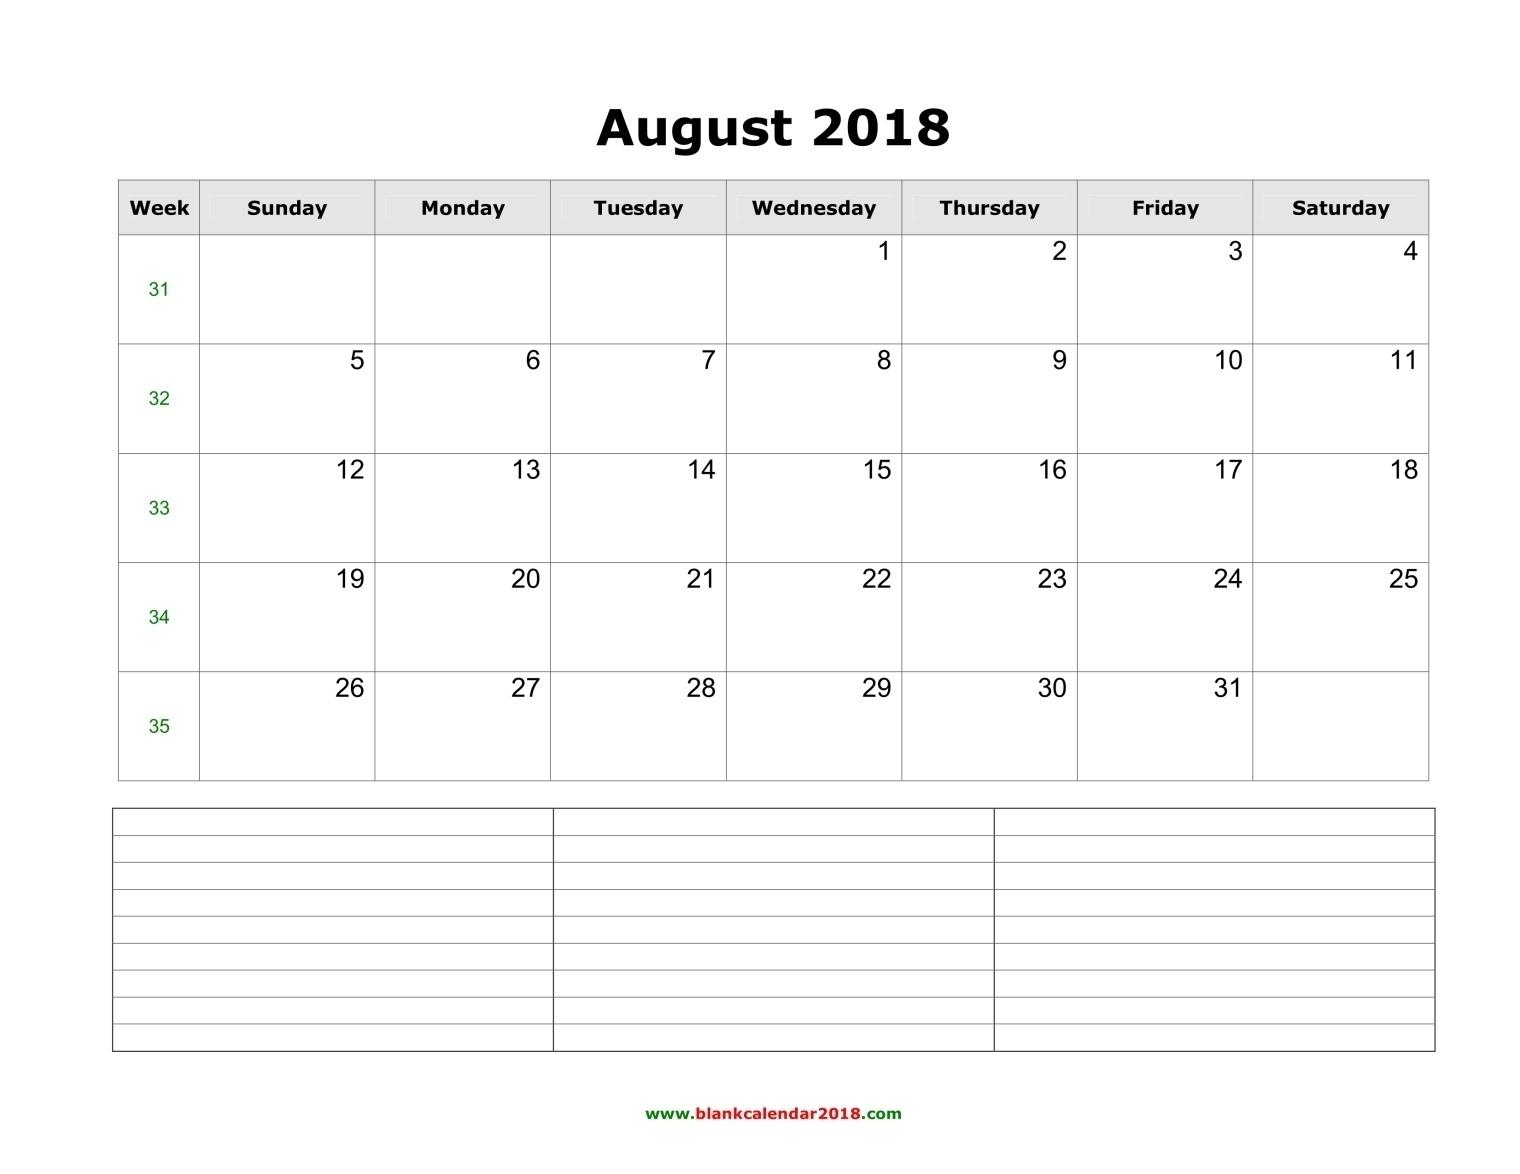 Blank Calendar For August 2018  Blank Calendar Template With Notes